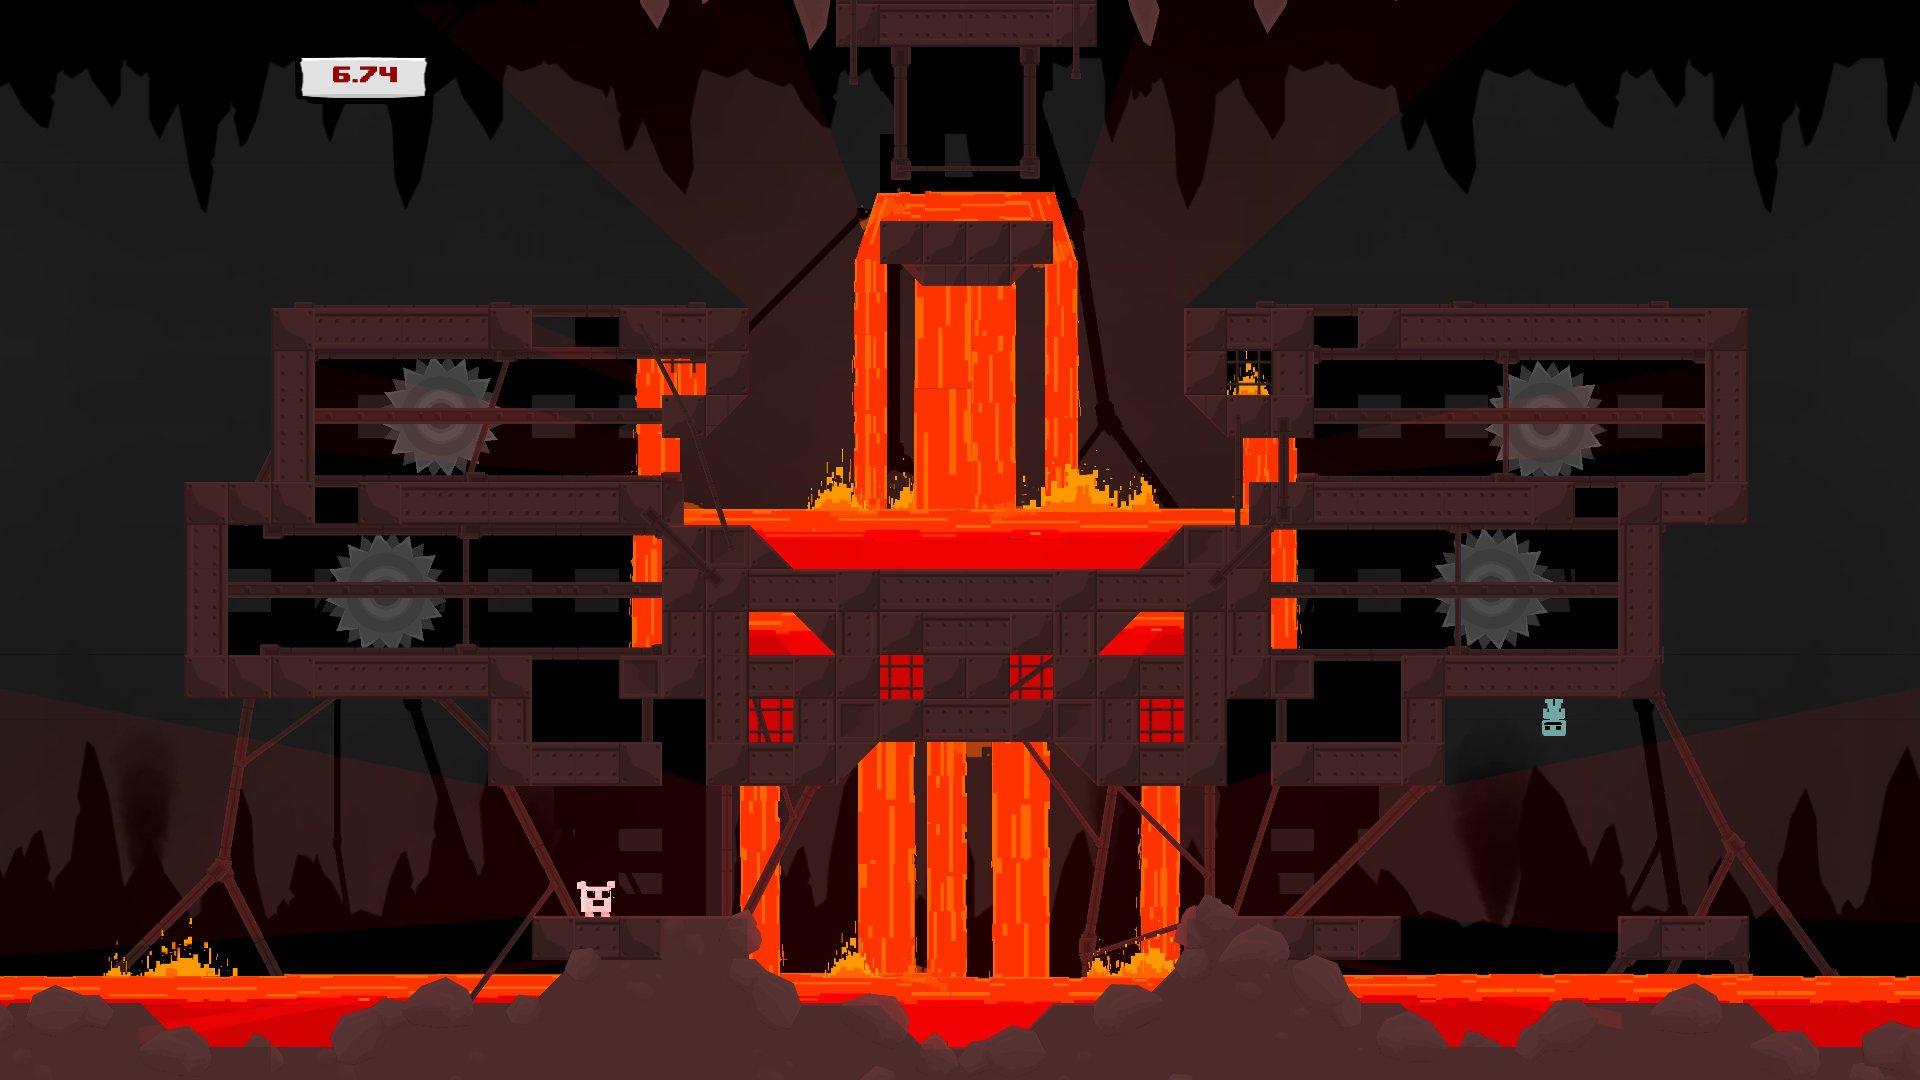 Sony назвала дату выхода Super Meat Boy на PS4 и PS Vita